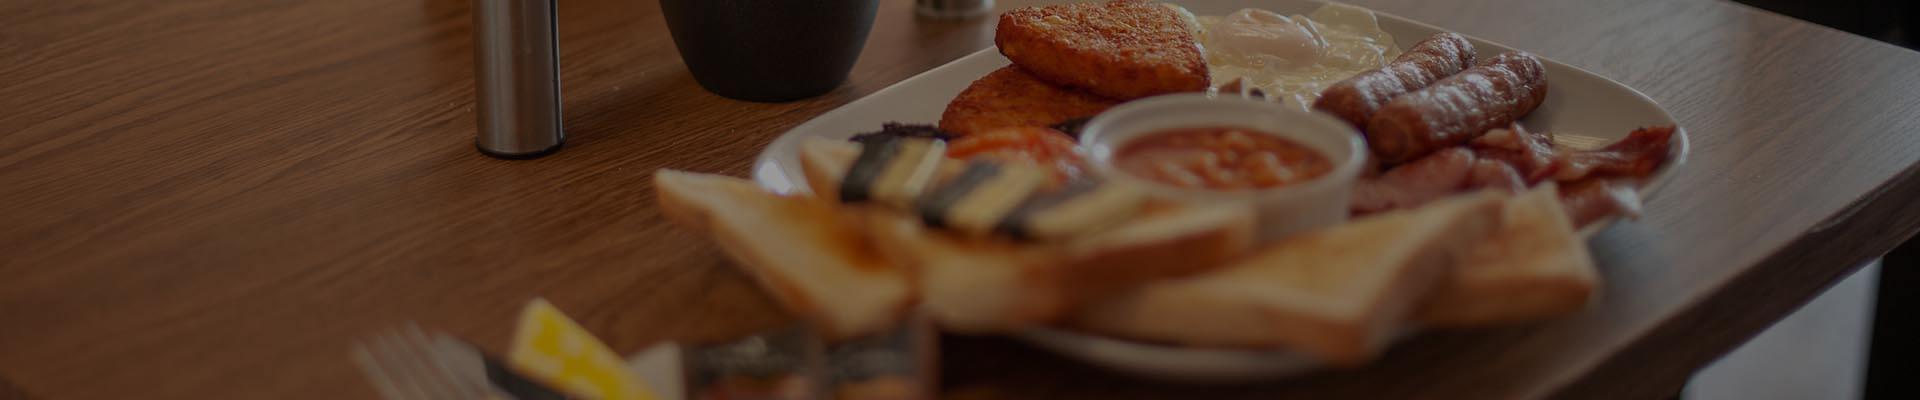 Fatso's Cafe